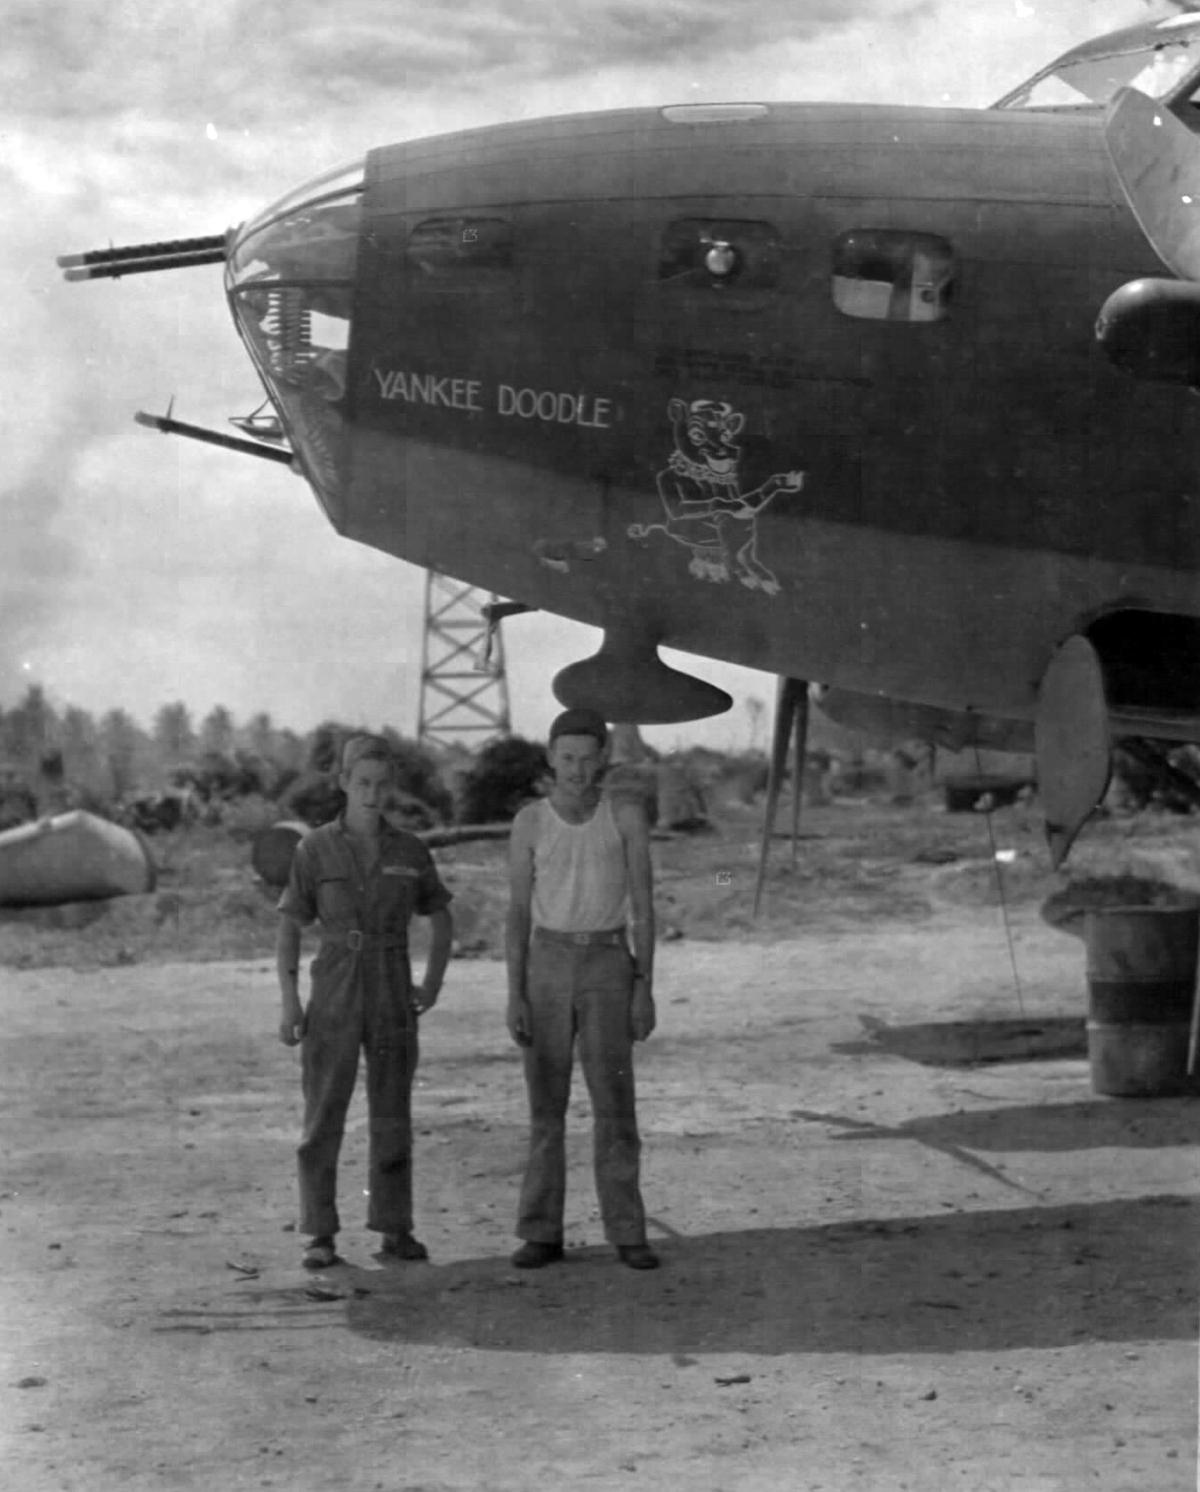 B-17 #41-2463 / Yankee Doodle